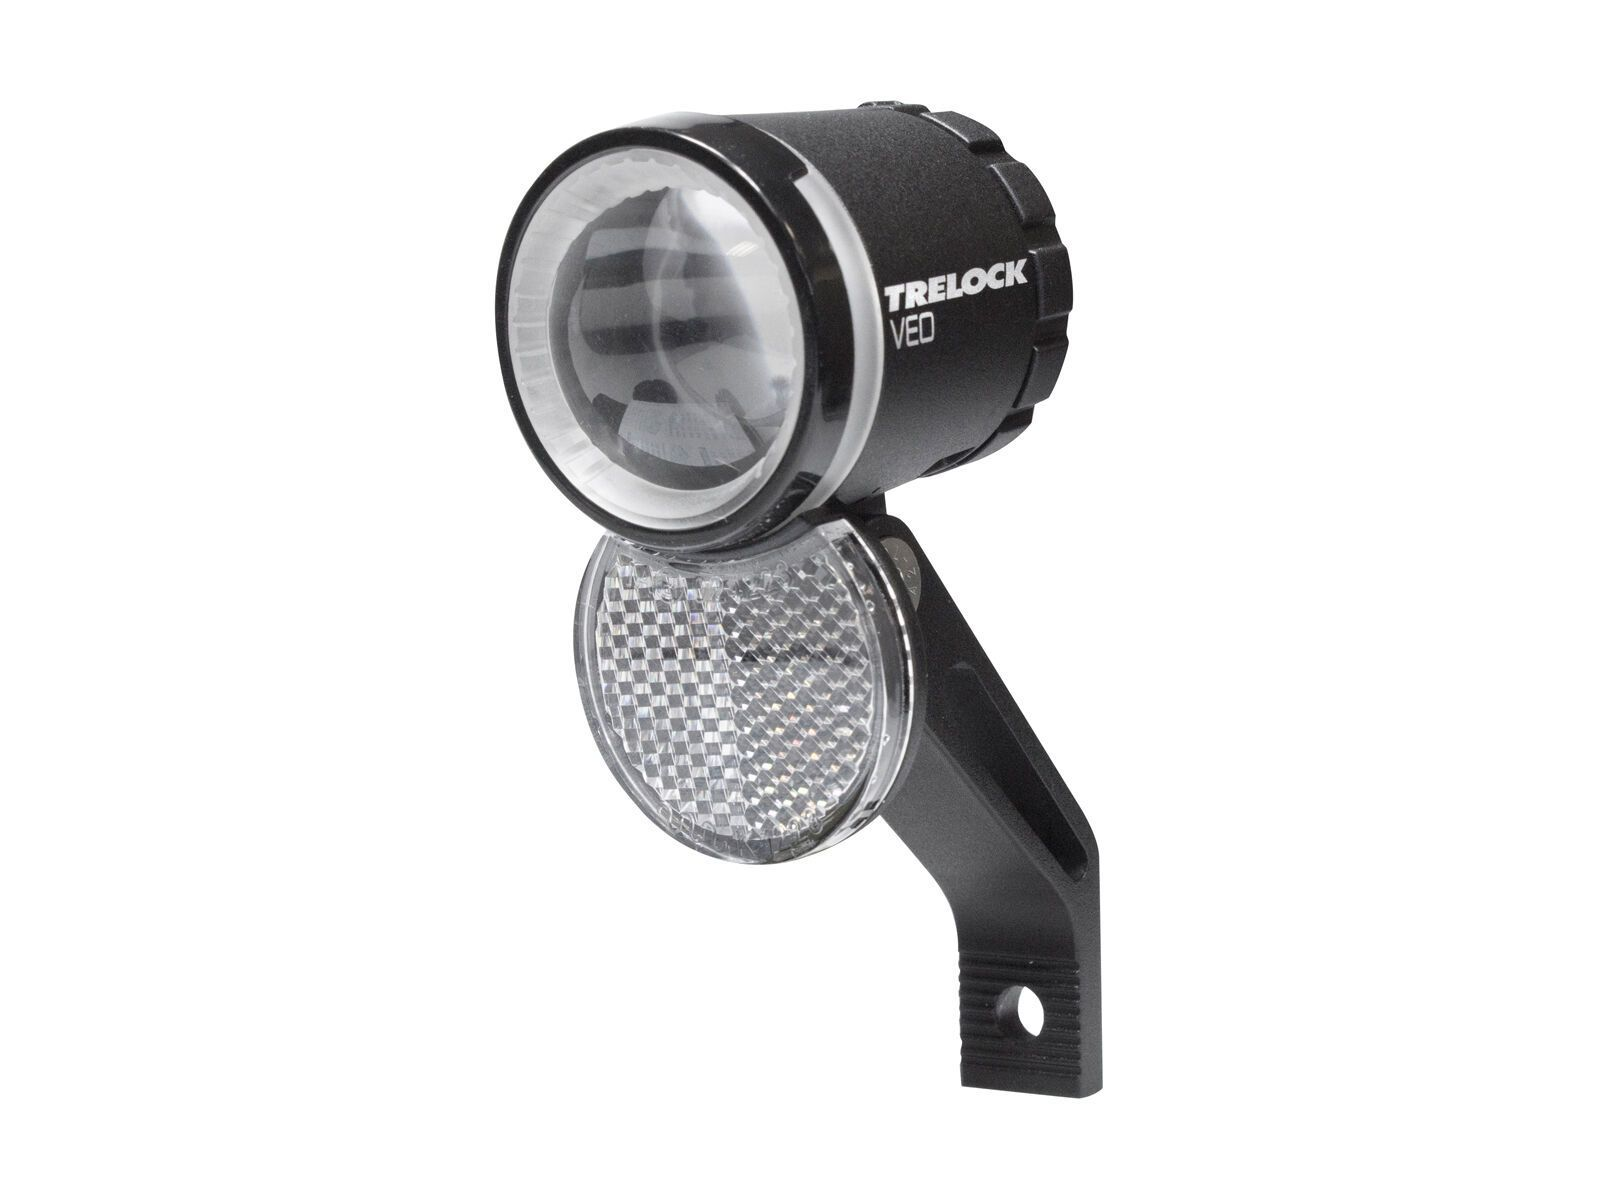 Trelock LS 382 Bike-i VEO 50 - Beleuchtung 8005212